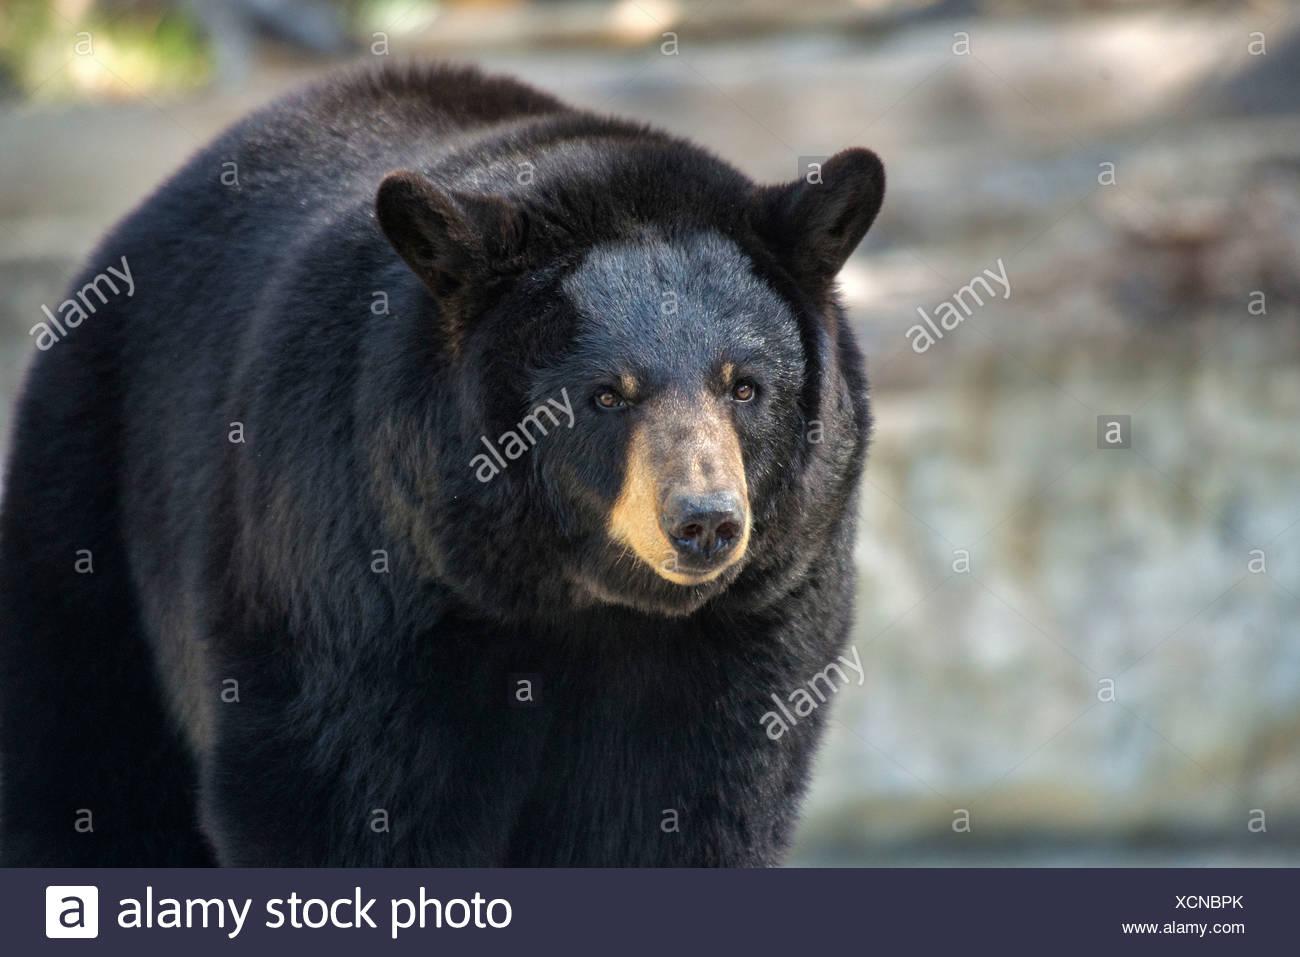 black bear, ursus americanus, bear, animal, USA, United States, America, - Stock Image